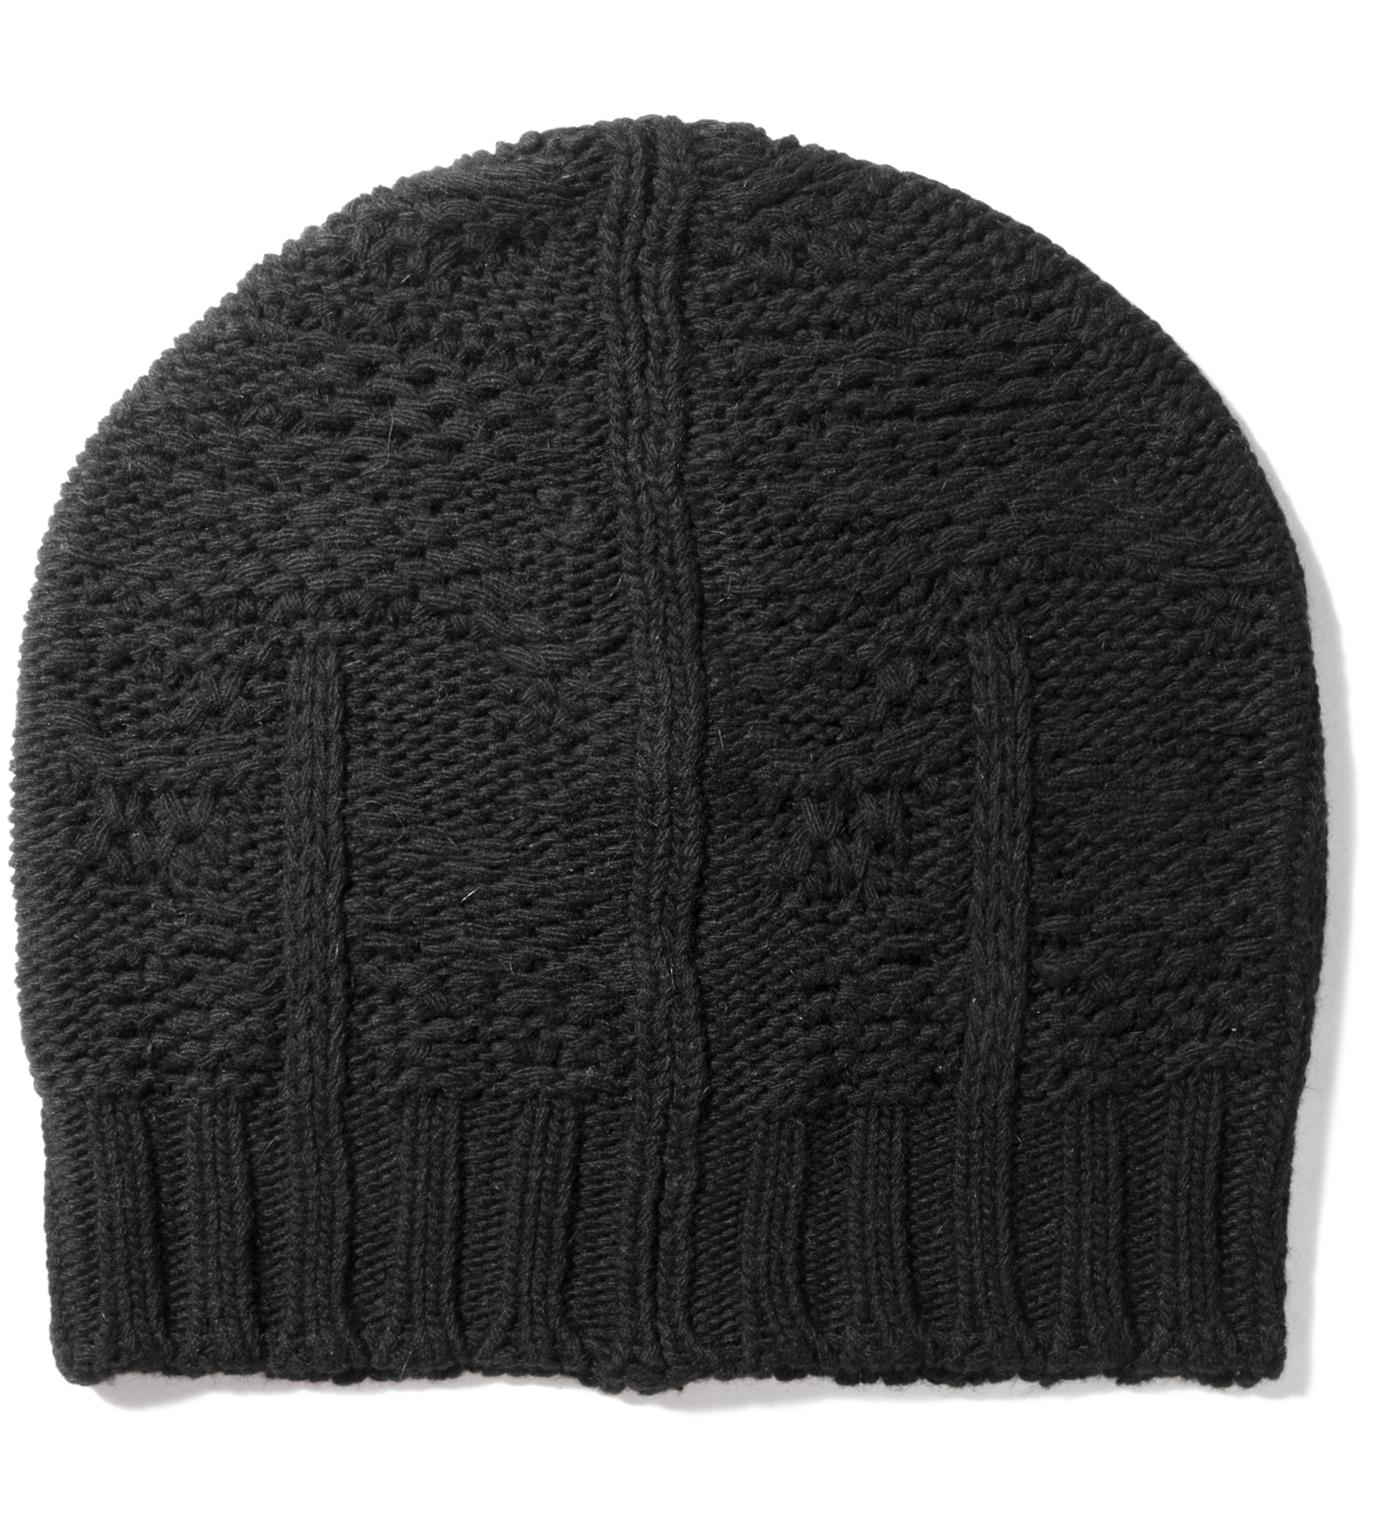 SILENT DAMIR DOMA Black Kali Knit Beanie